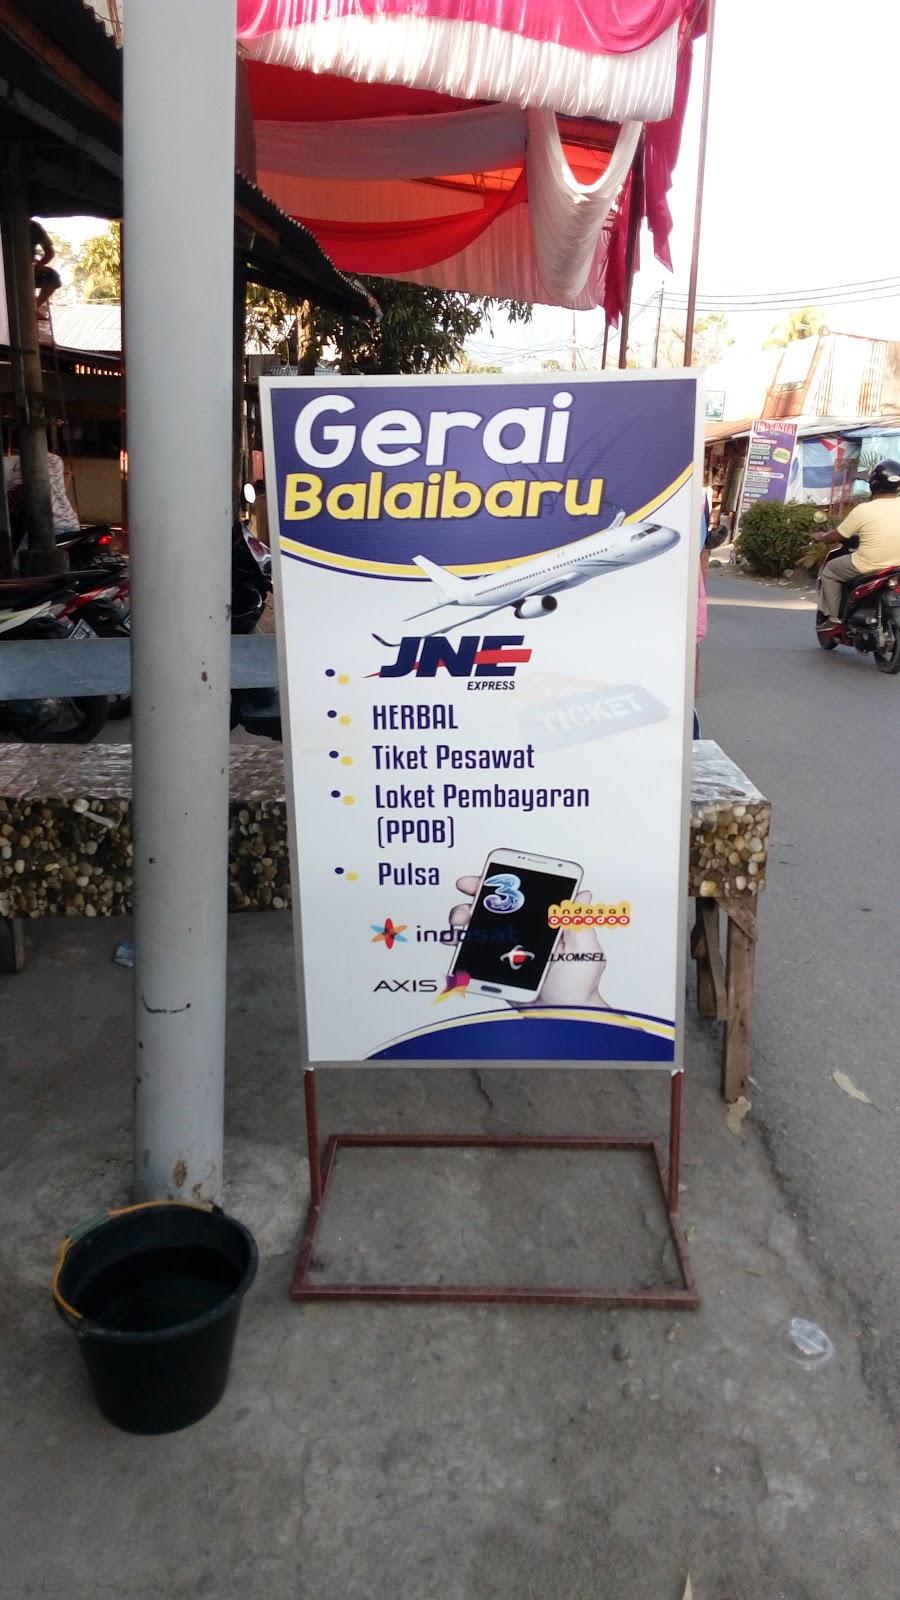 Agen Jne Balai Baru Online Wilayah Gunung Sarik Sungai Sapih Kalumbuk Siteba